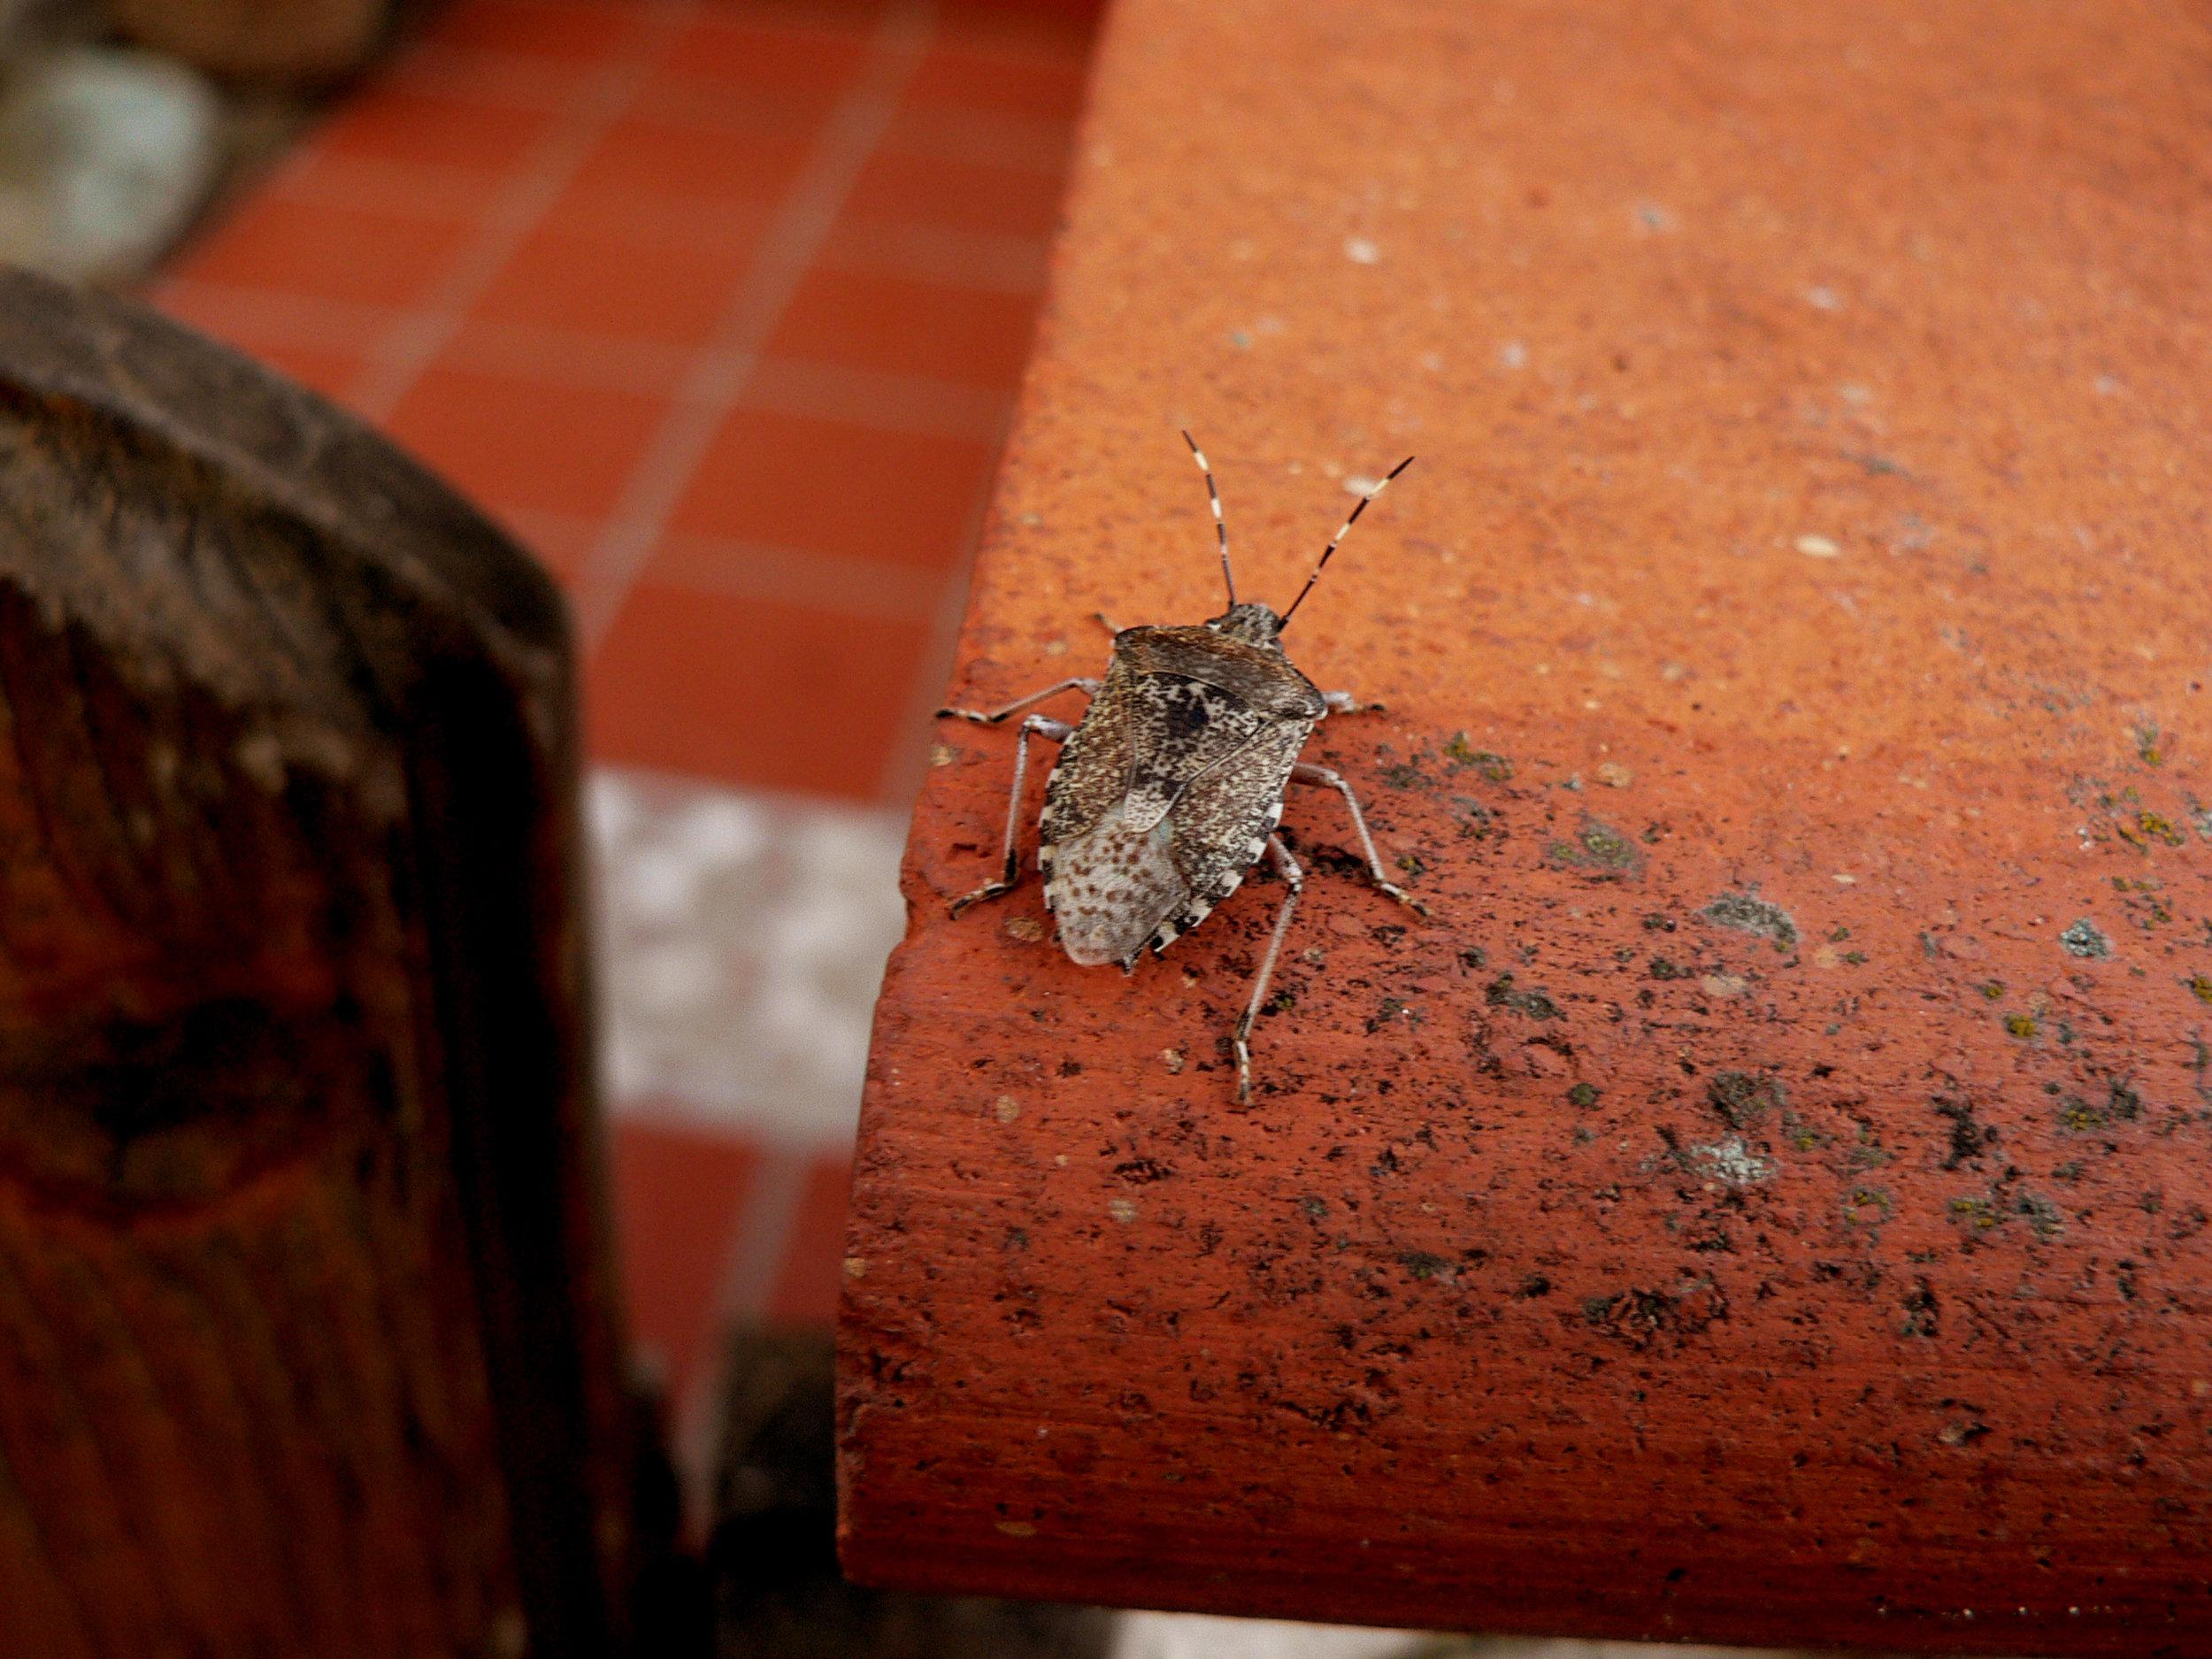 stinkbug-in-action-1365279.jpg